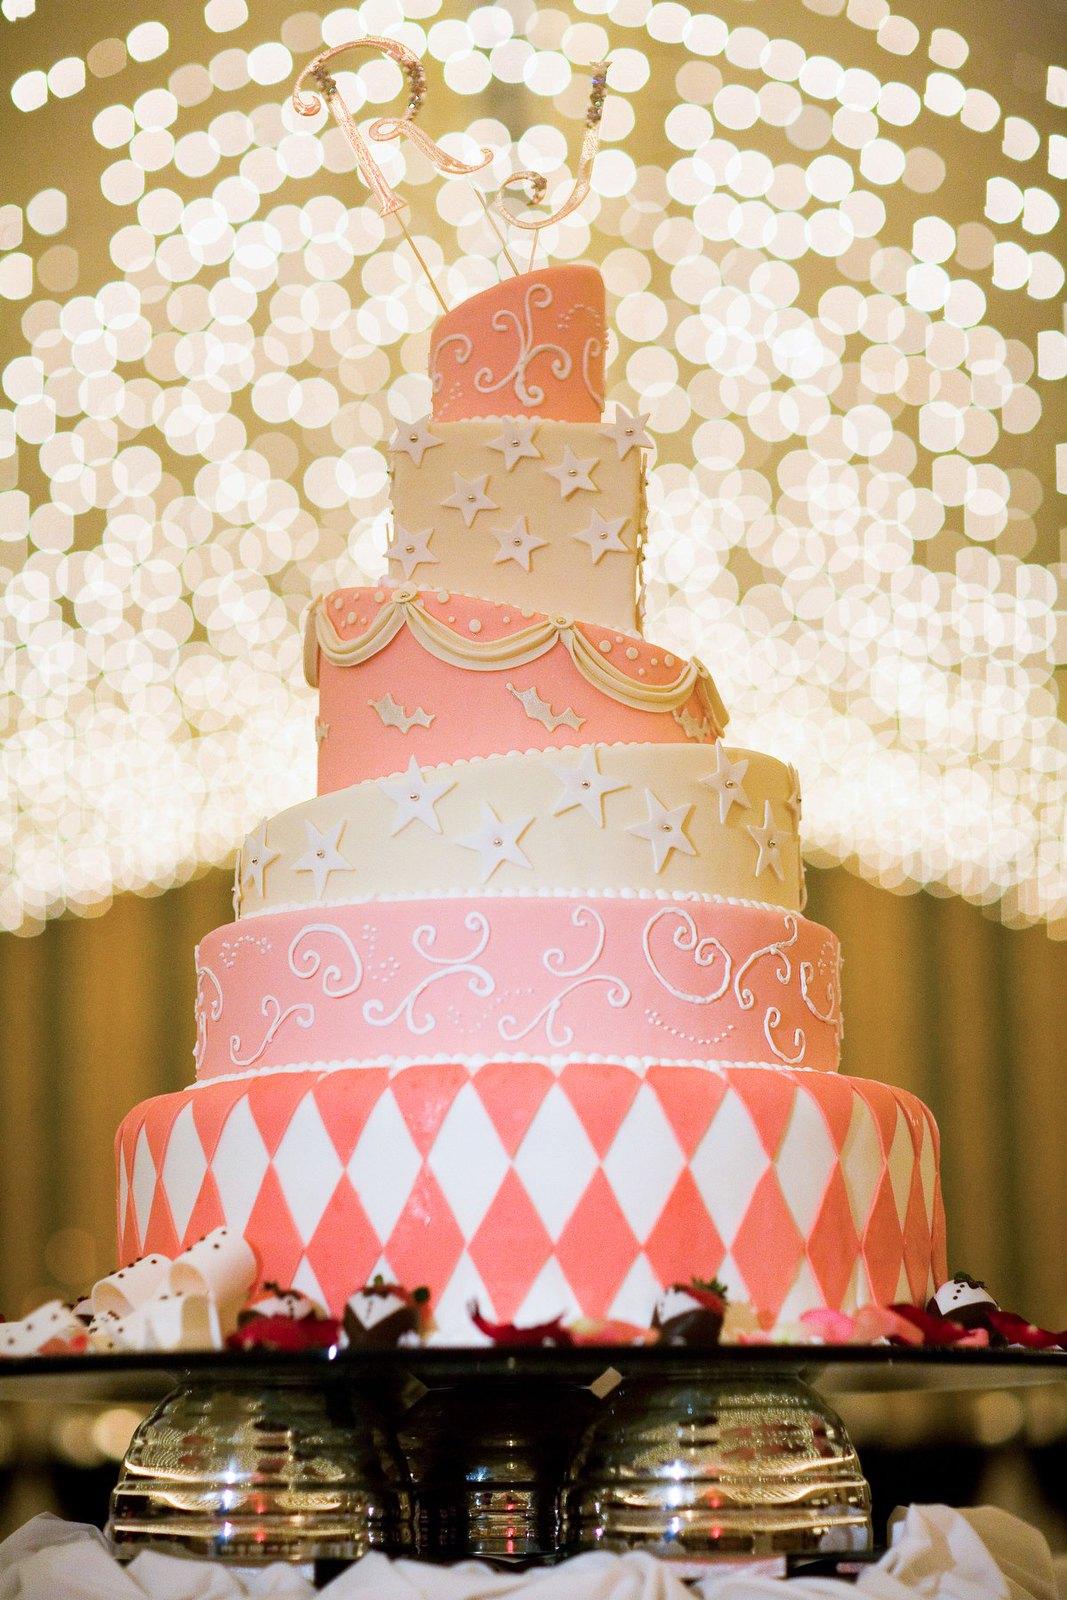 Cake by Slice